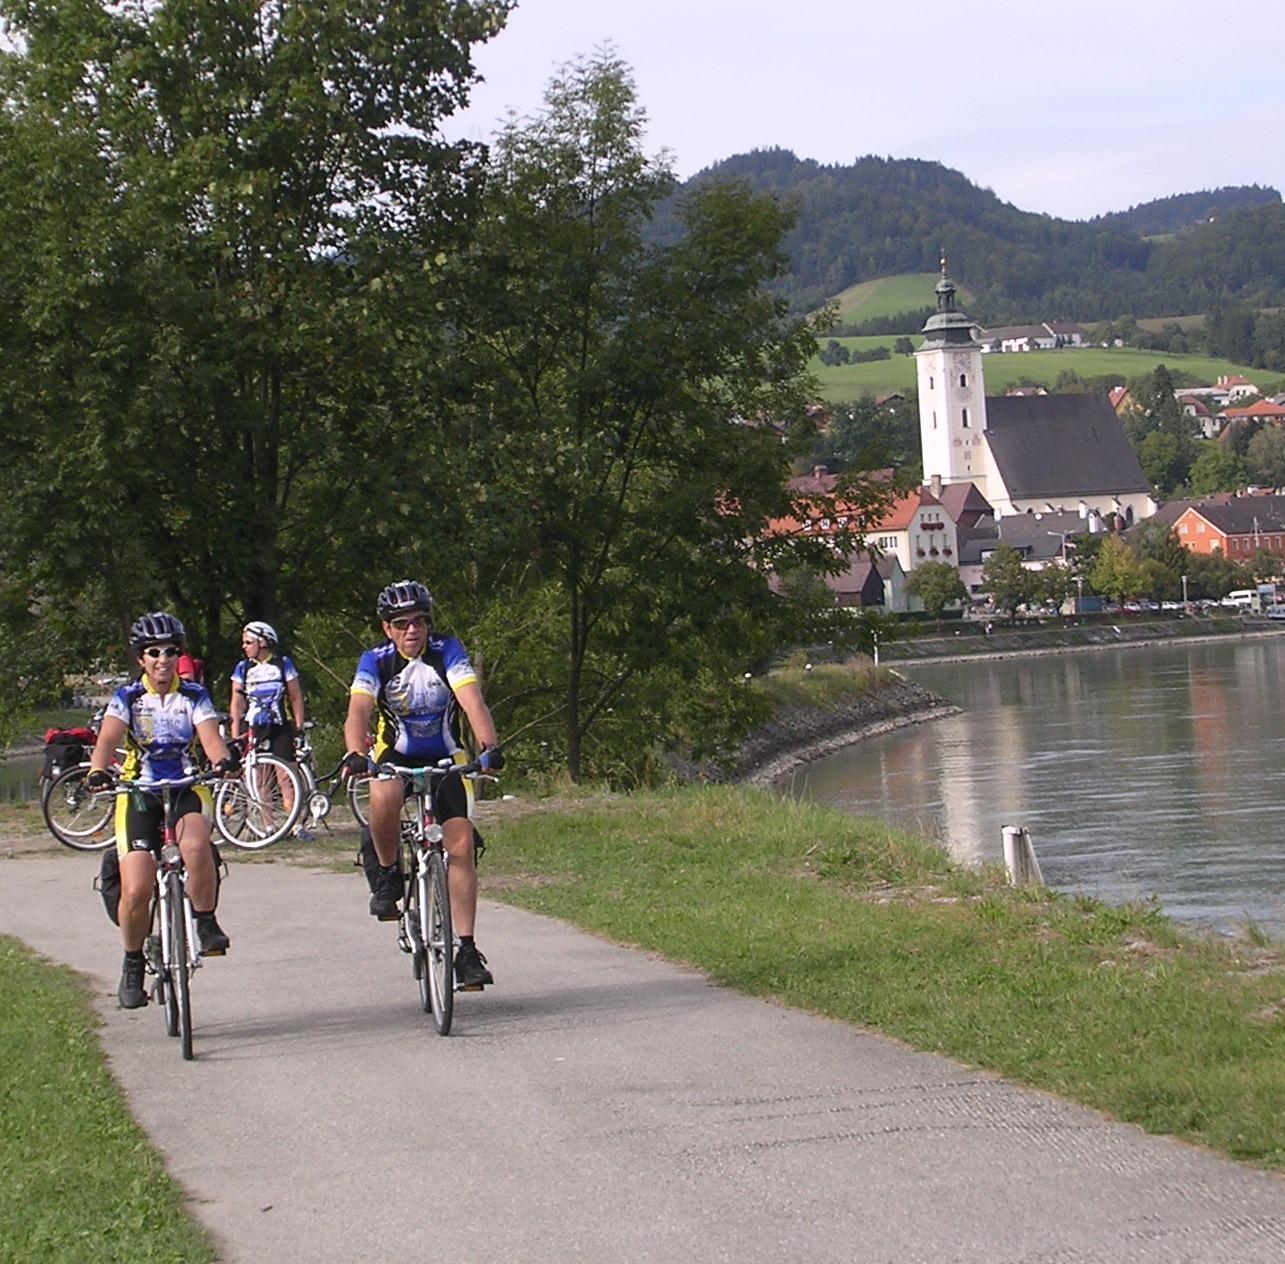 European Bicycle Tour Companies Offer Values Despite Weak Dollar